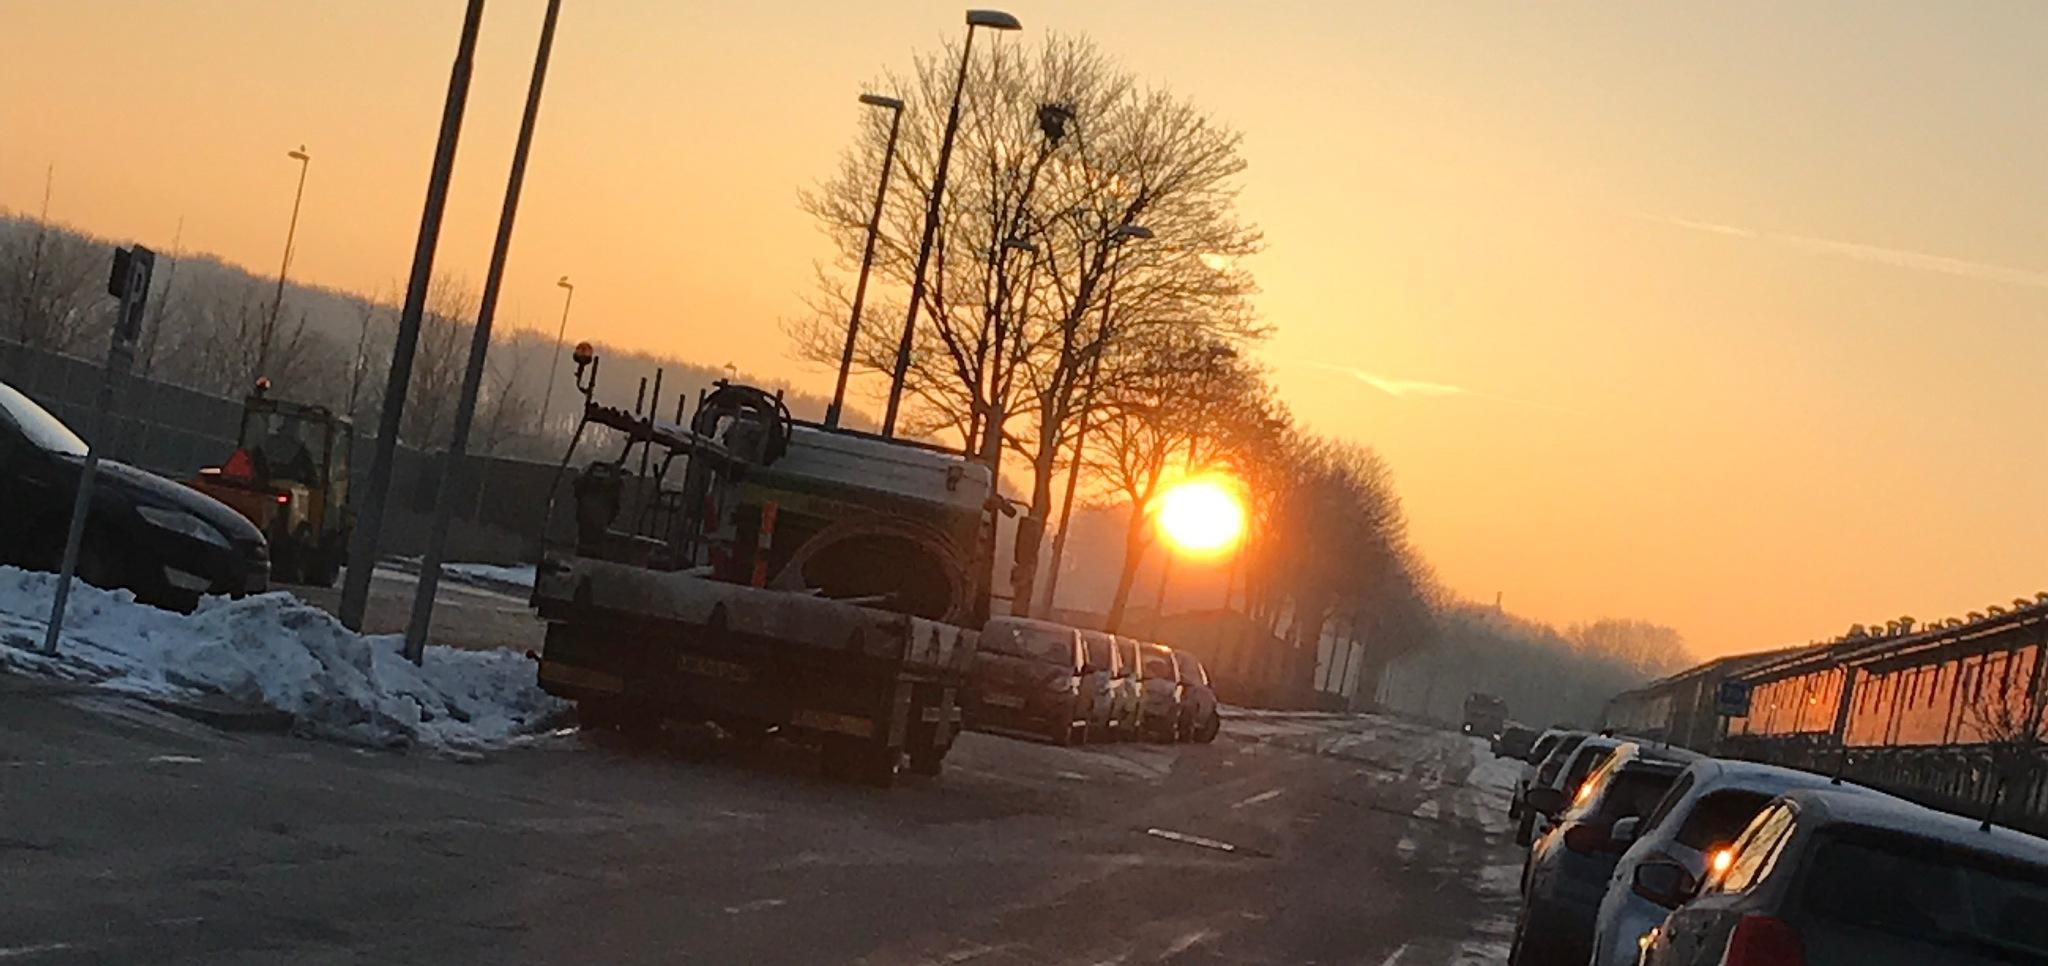 Sunrise  by Faduma Mire